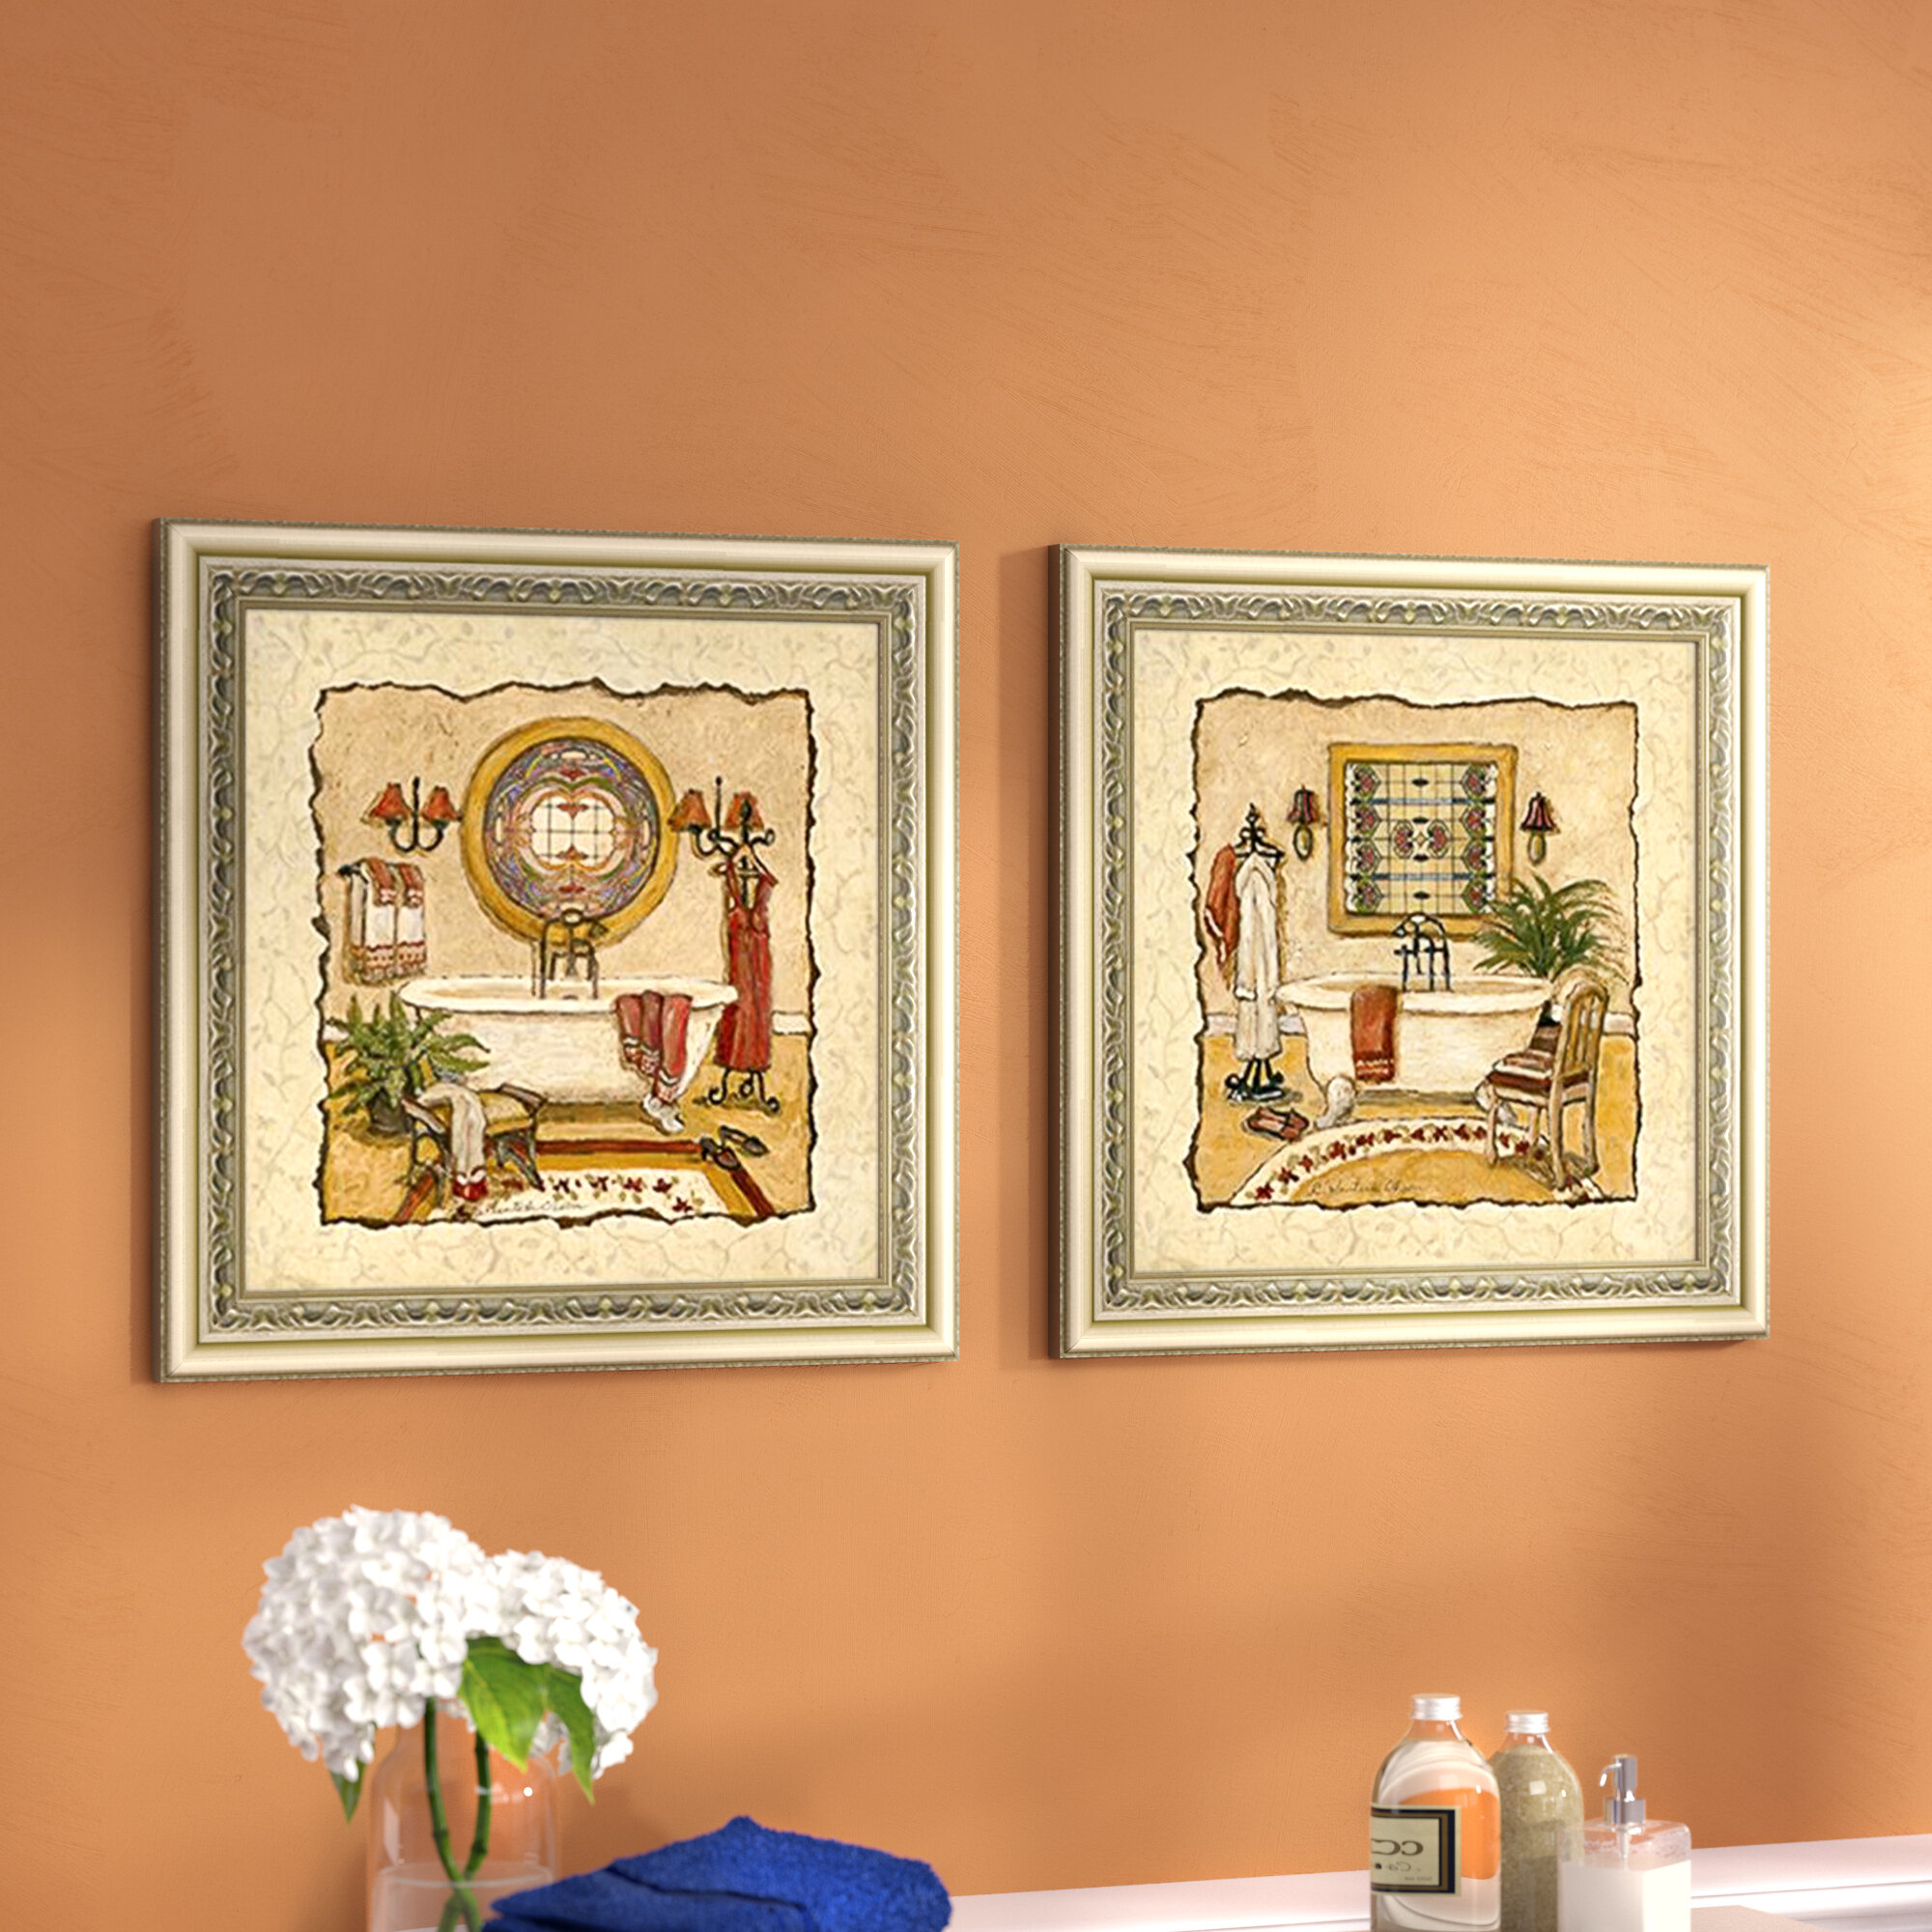 Famous Framed Wall Art For Bathrooms Photos - The Wall Art ...